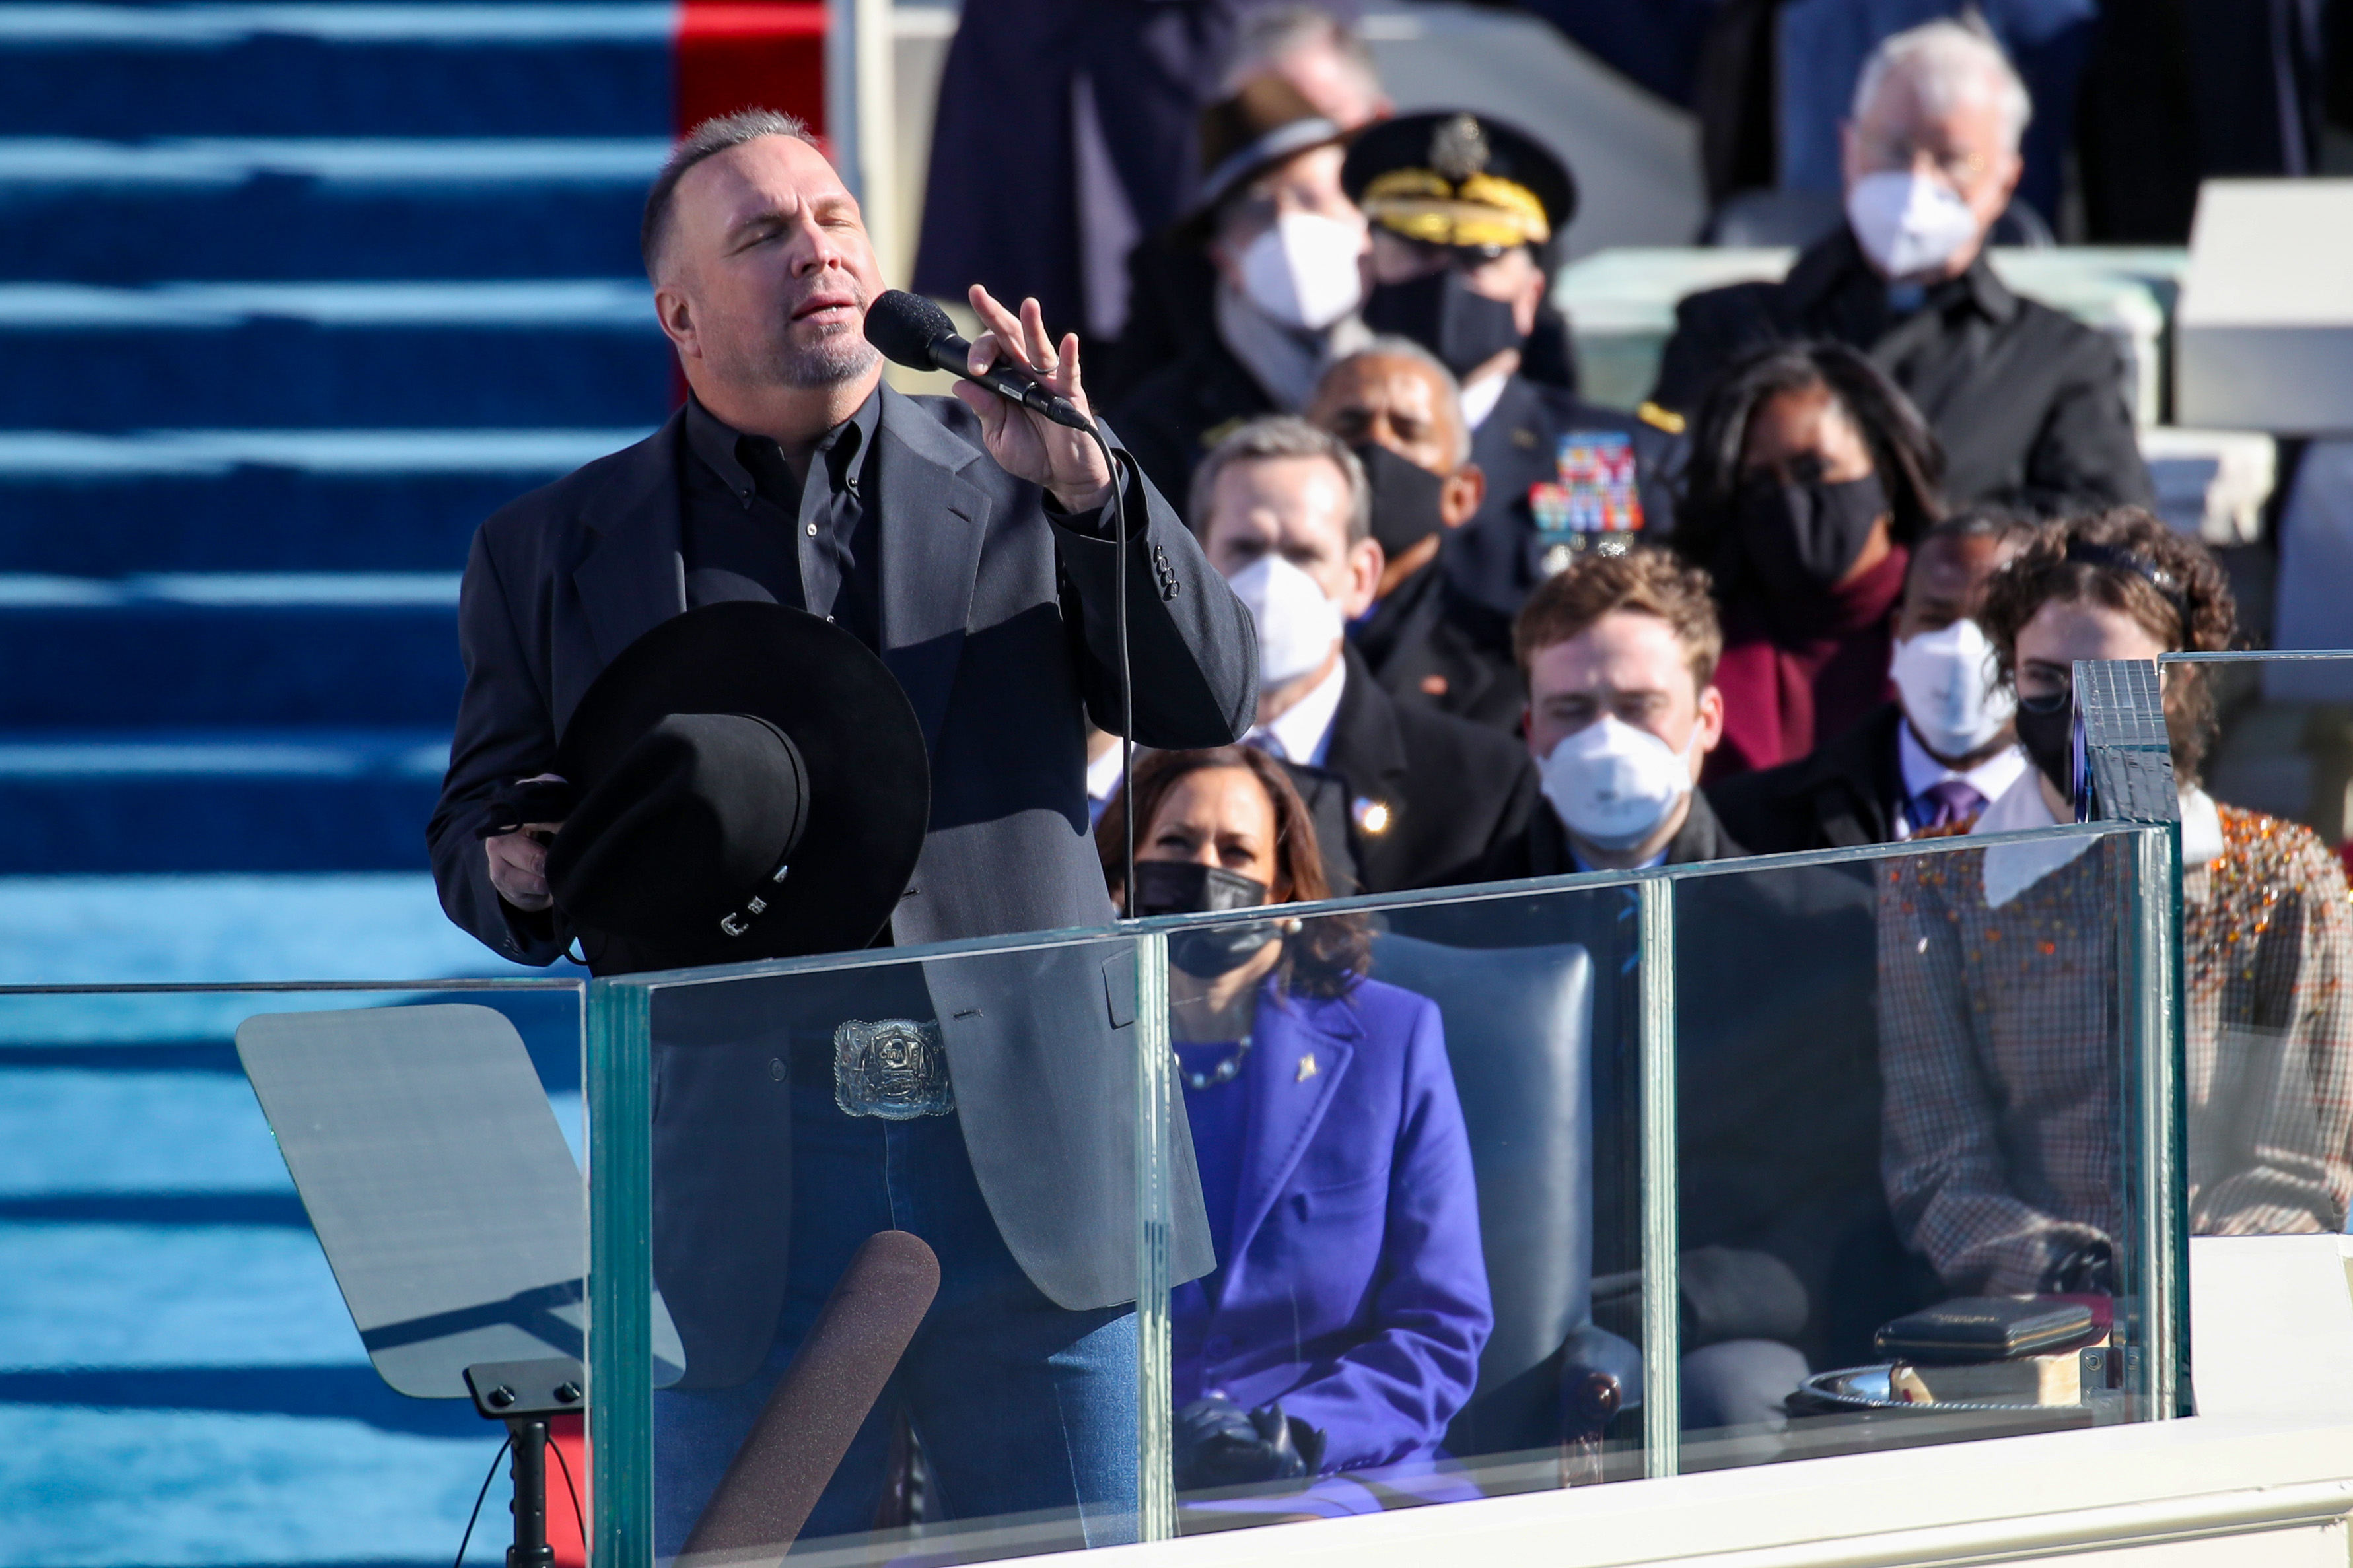 Garth Brooks performs  Amazing Grace  at President Joe Biden's inauguration.